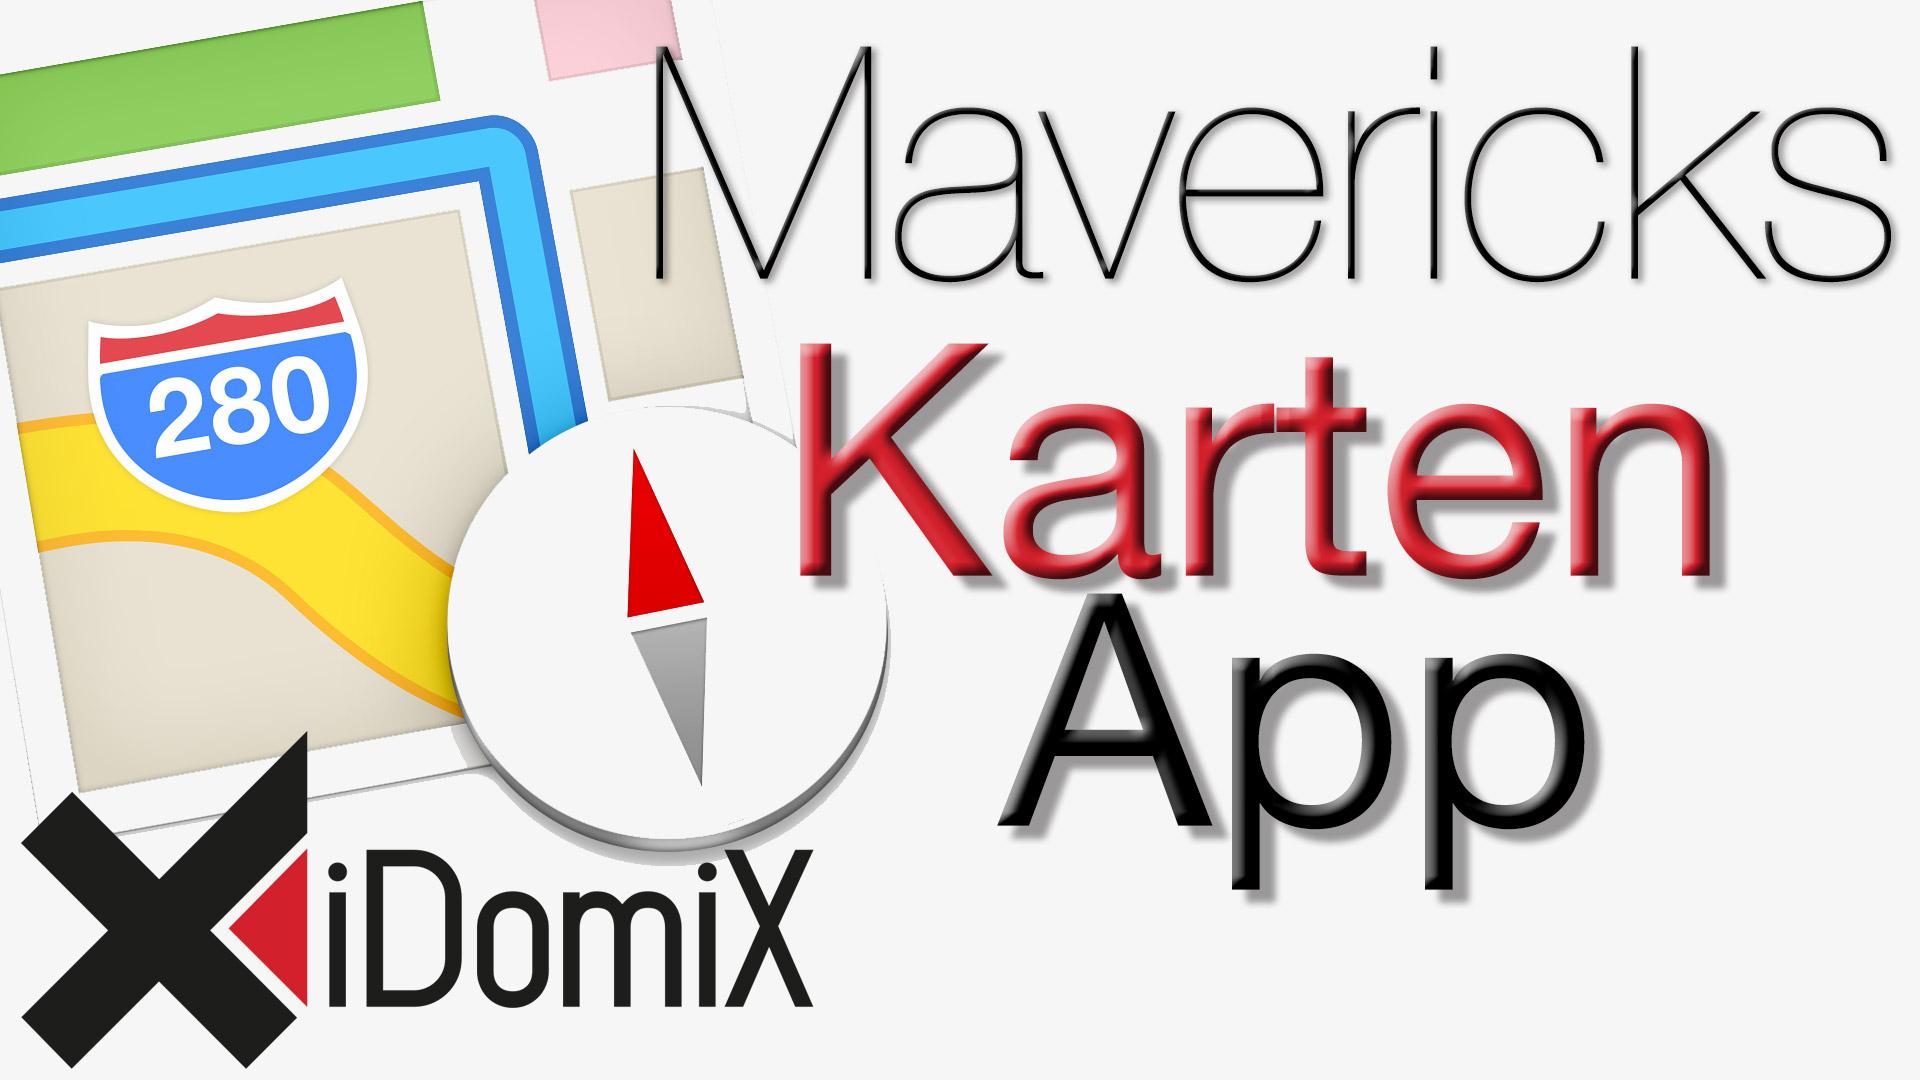 OS X Mavericks Karten App